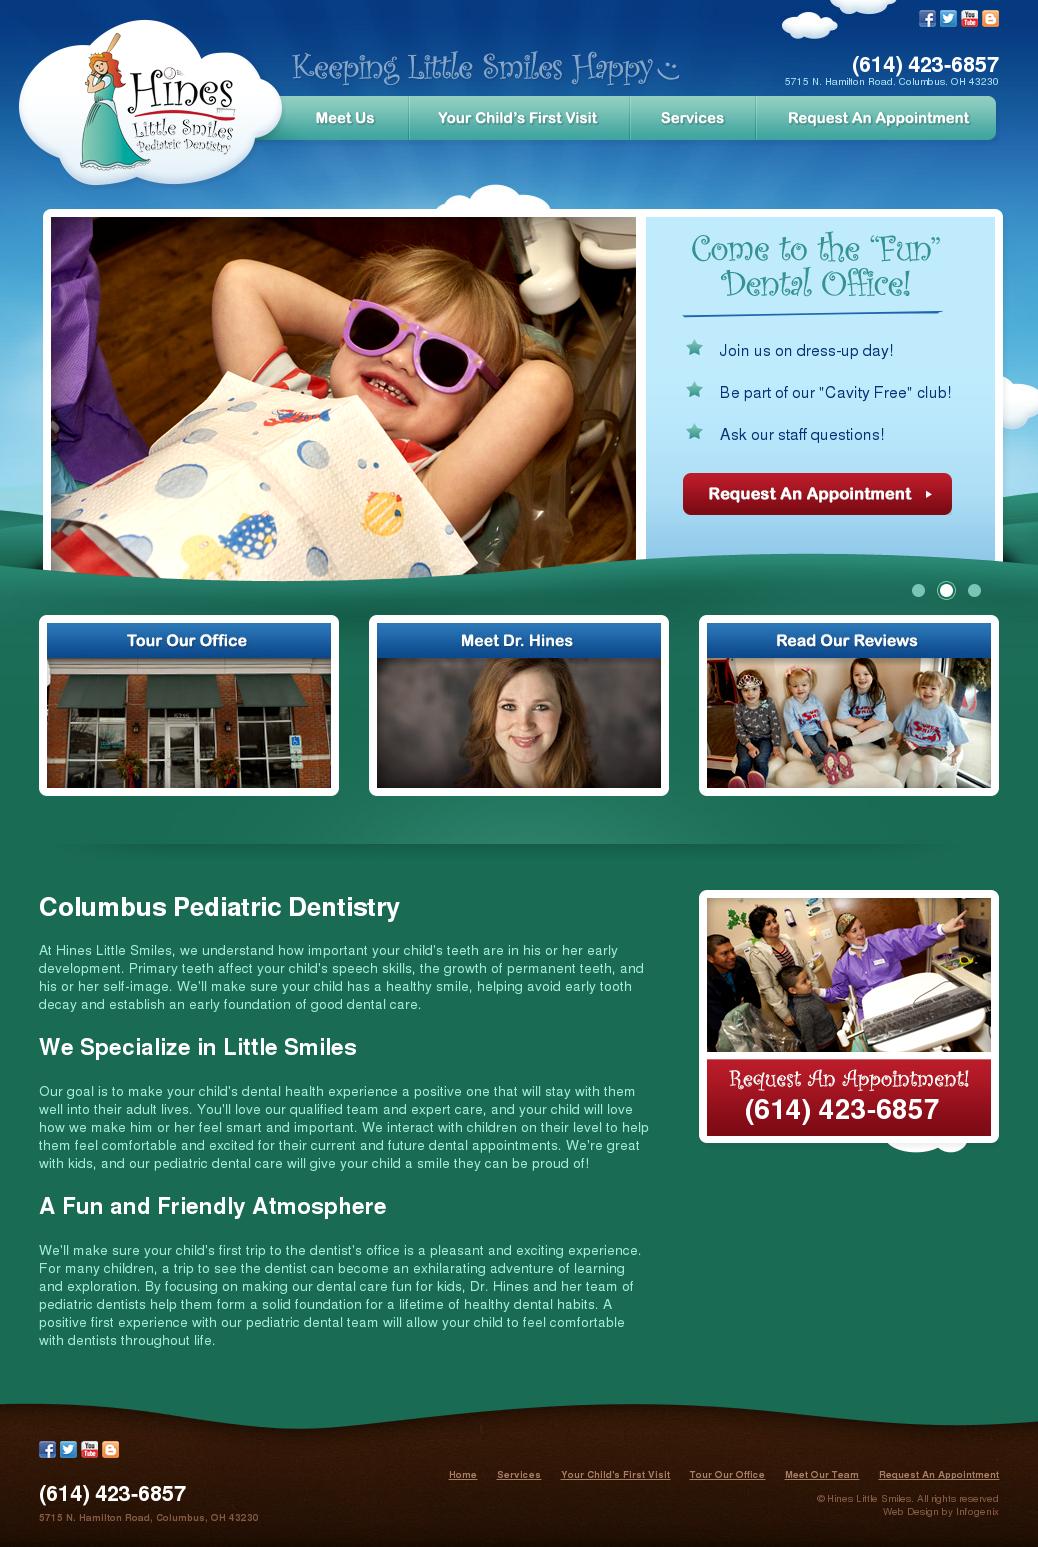 Columbus Pediatrics Dentistry